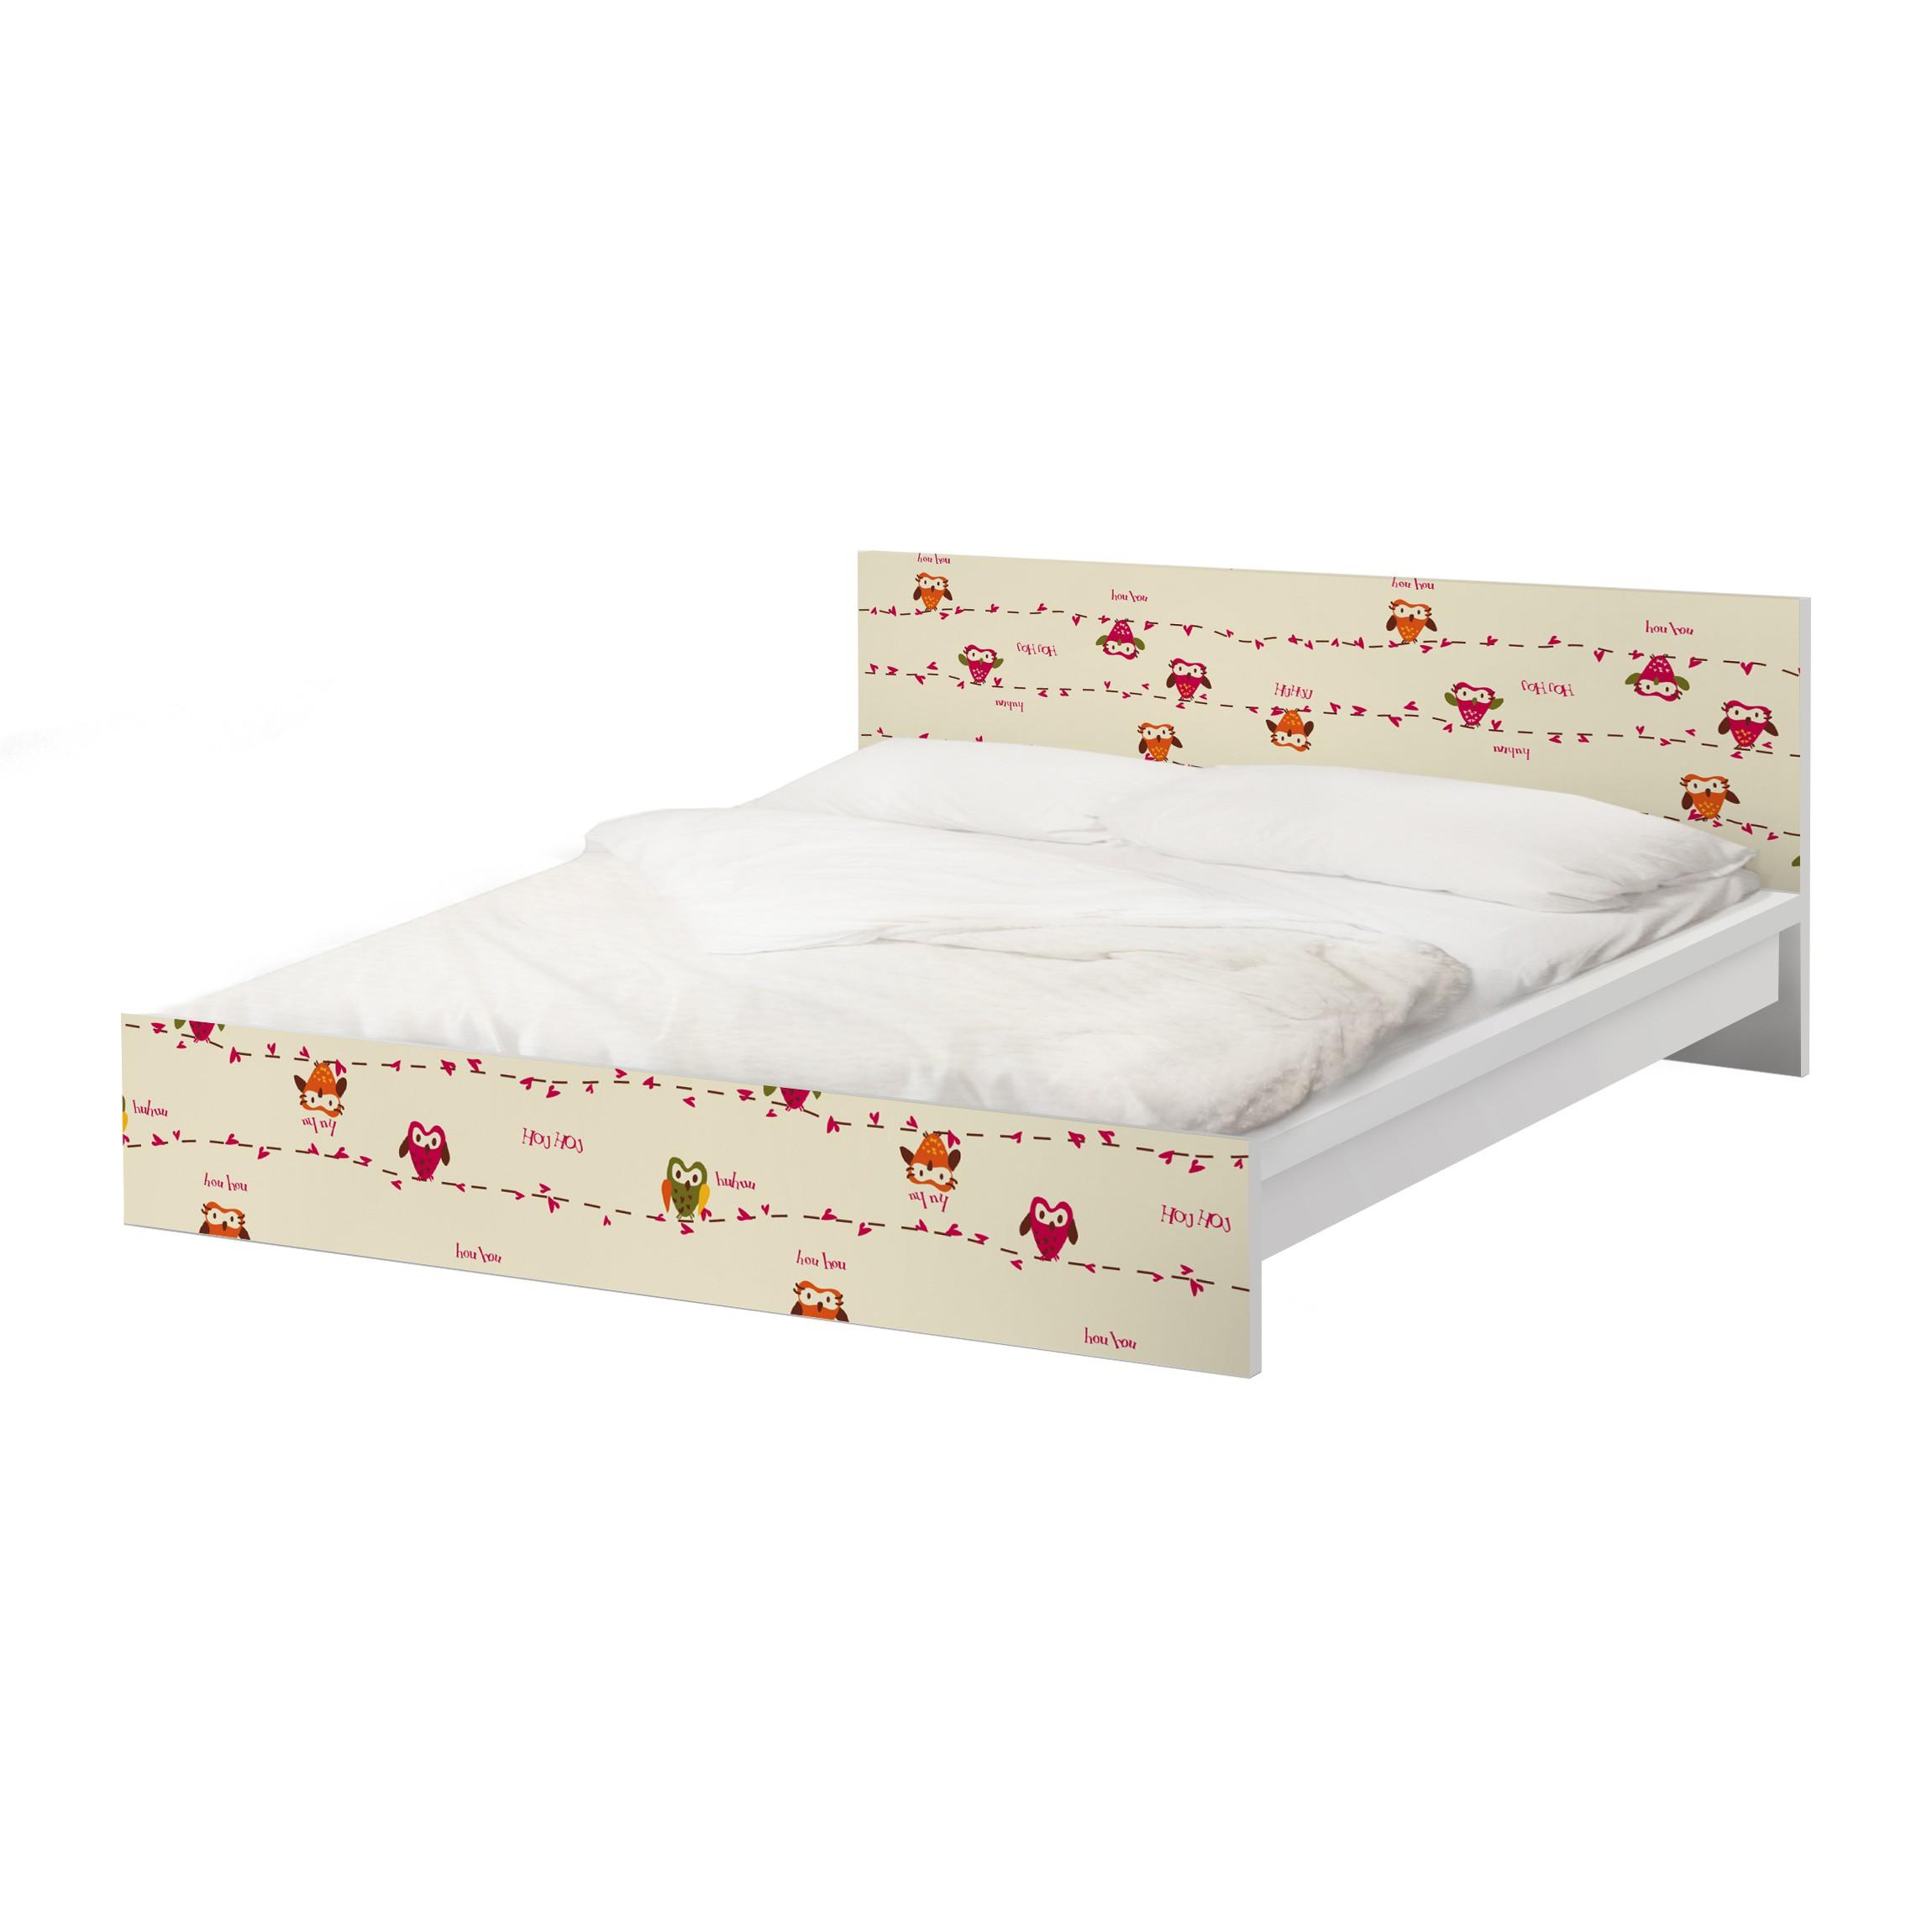 m belfolie f r ikea malm bett niedrig 140x200cm klebefolie owl howl. Black Bedroom Furniture Sets. Home Design Ideas